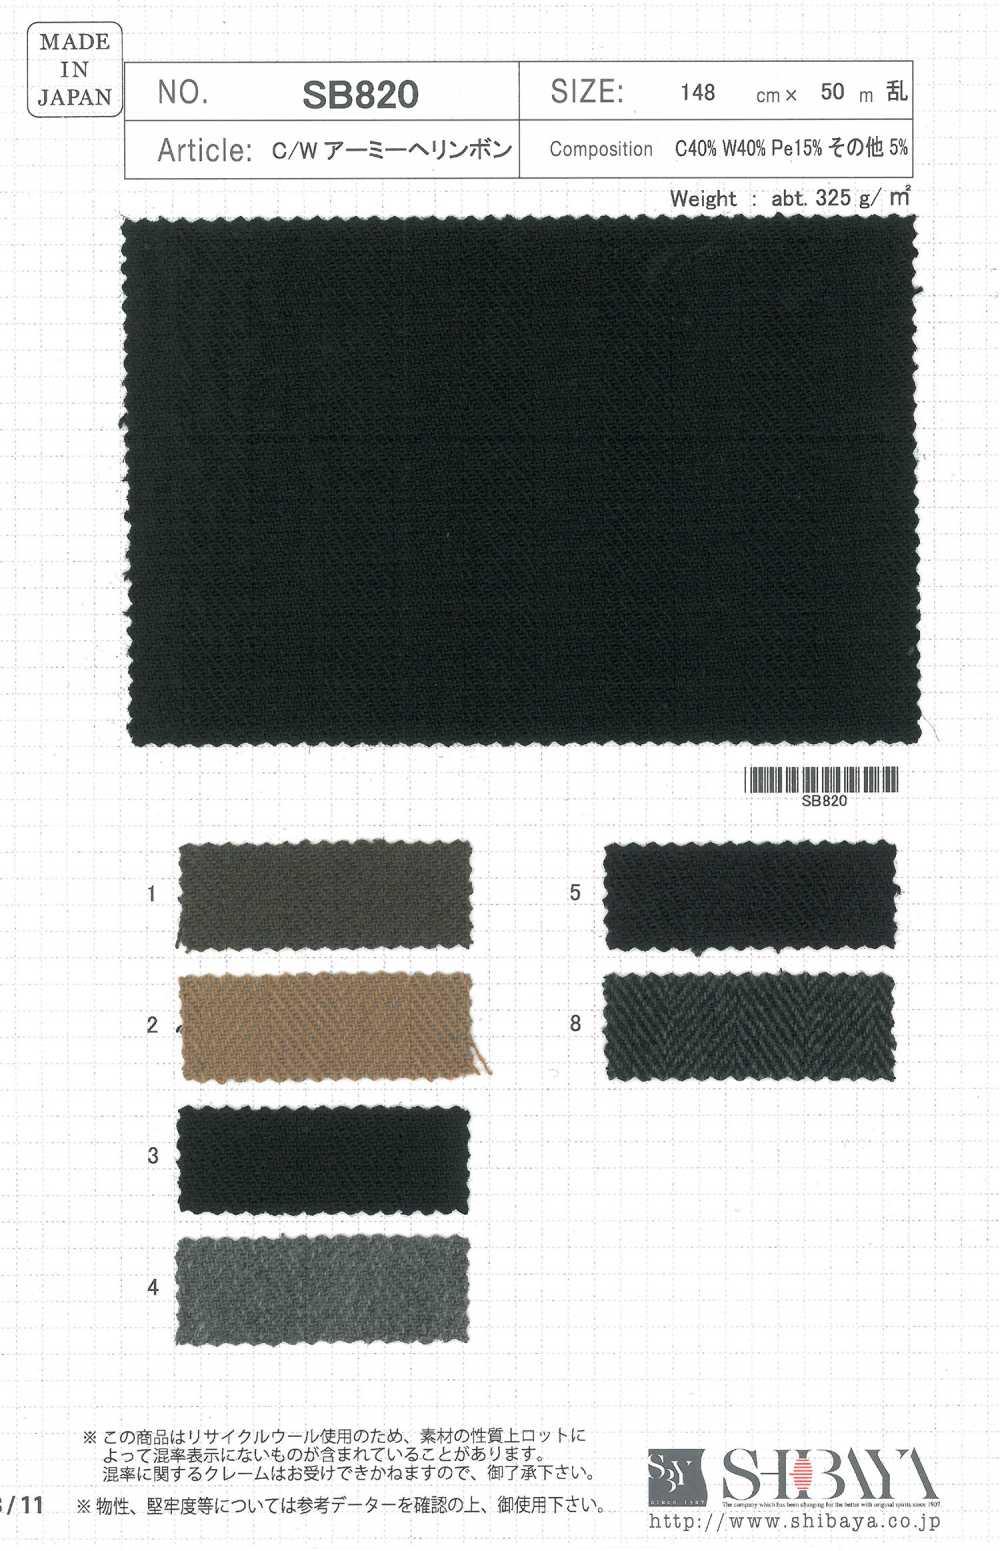 SB820 C/W アーミーヘリンボン[生地] 柴屋/オークラ商事 - ApparelX アパレル資材卸通販